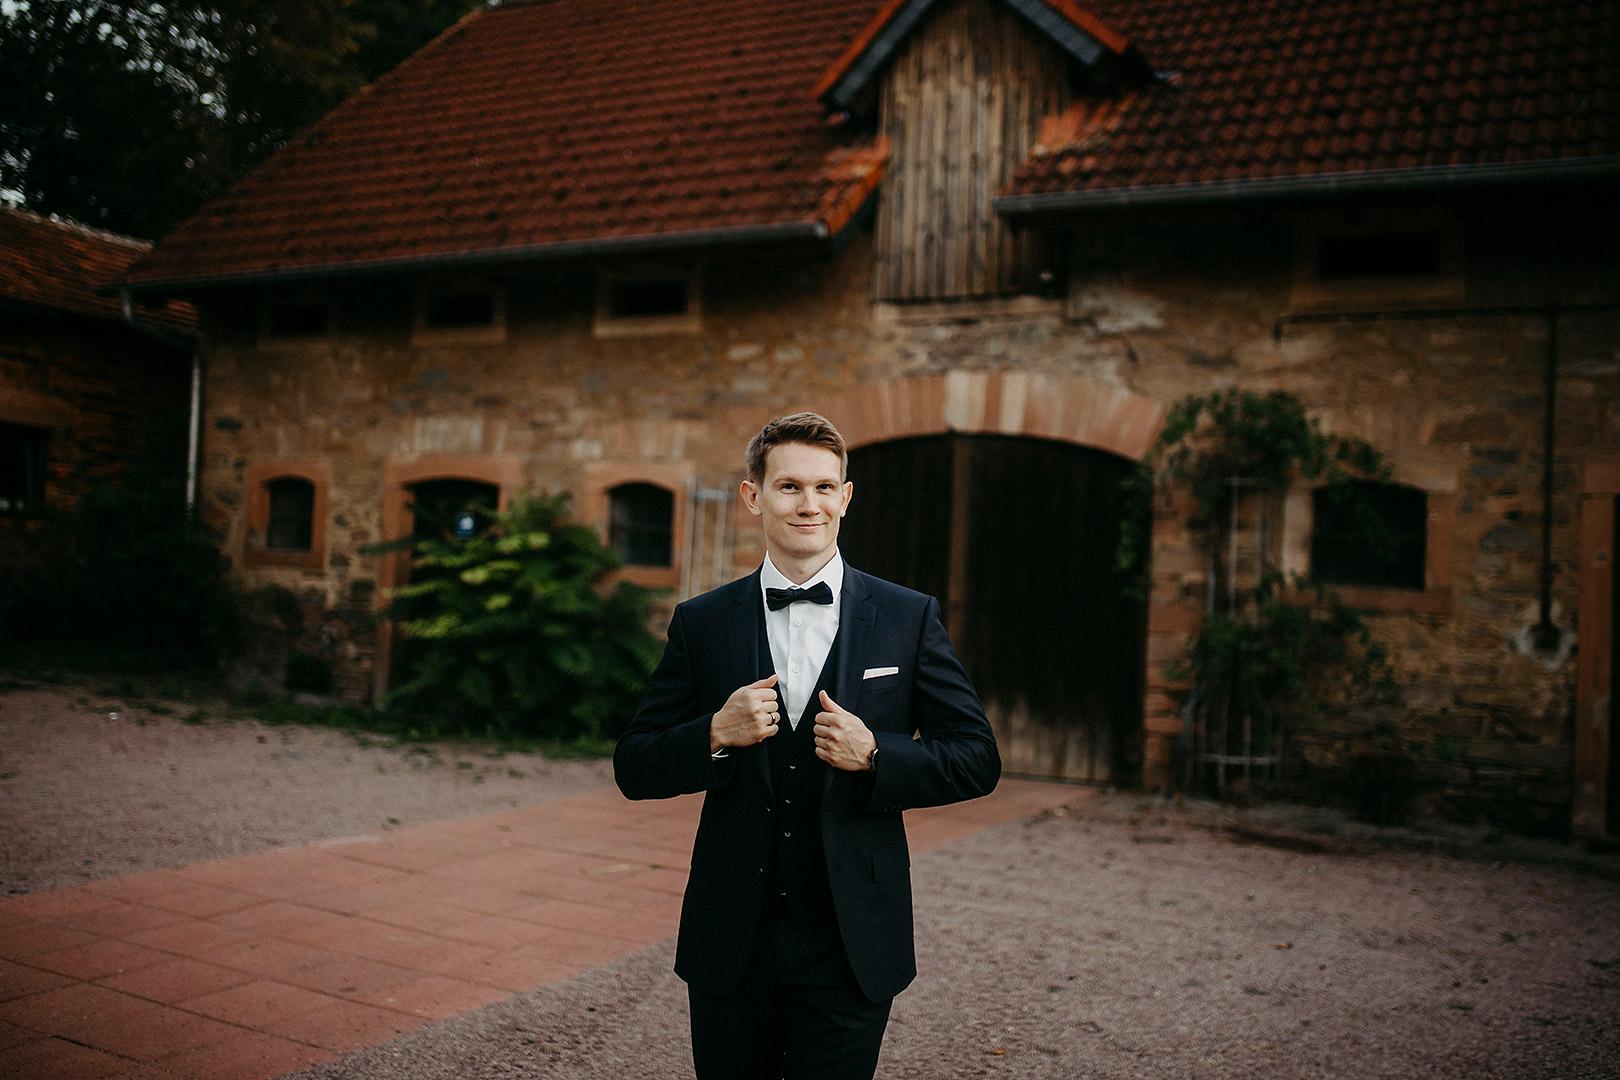 portrait_wedding_saskiaunddavid_75